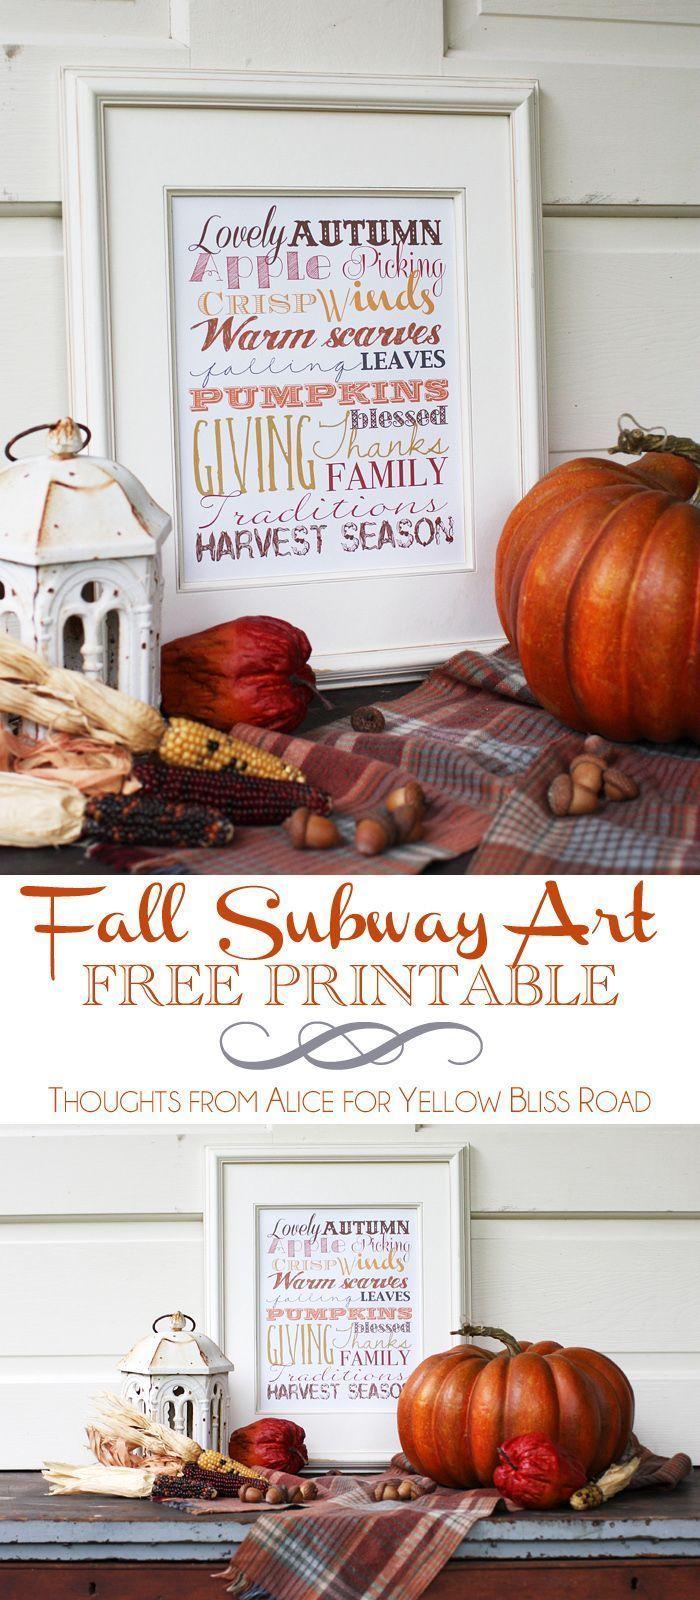 Fall Subway Art Free Printable | DIY Decor